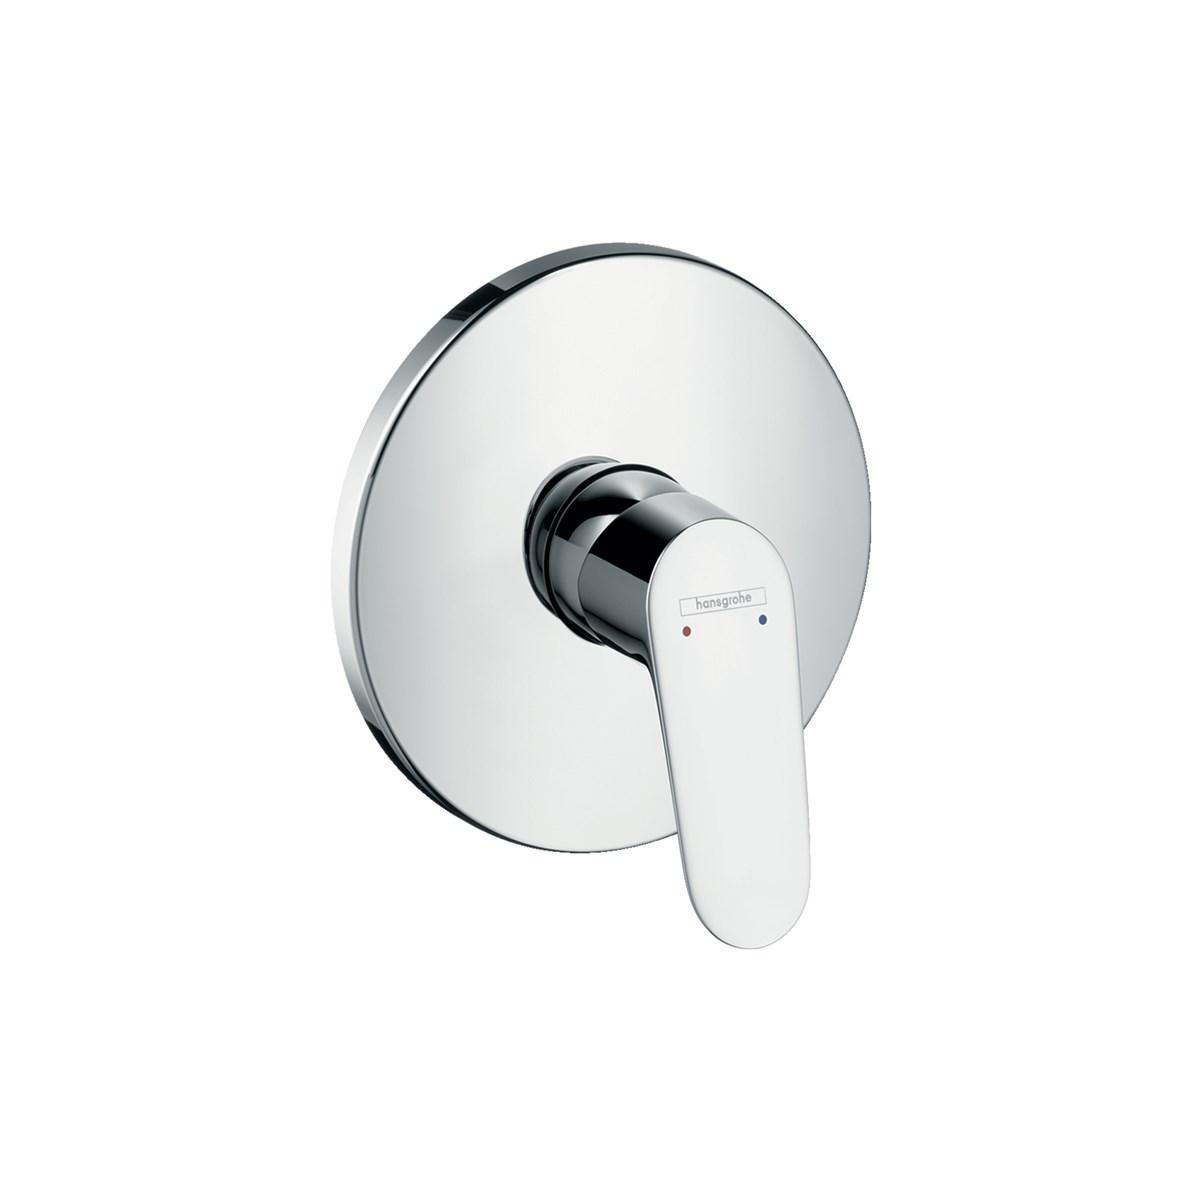 Hansgrohe-Focus-Shower-Mixer-Concealed-31965000-Matisse-1